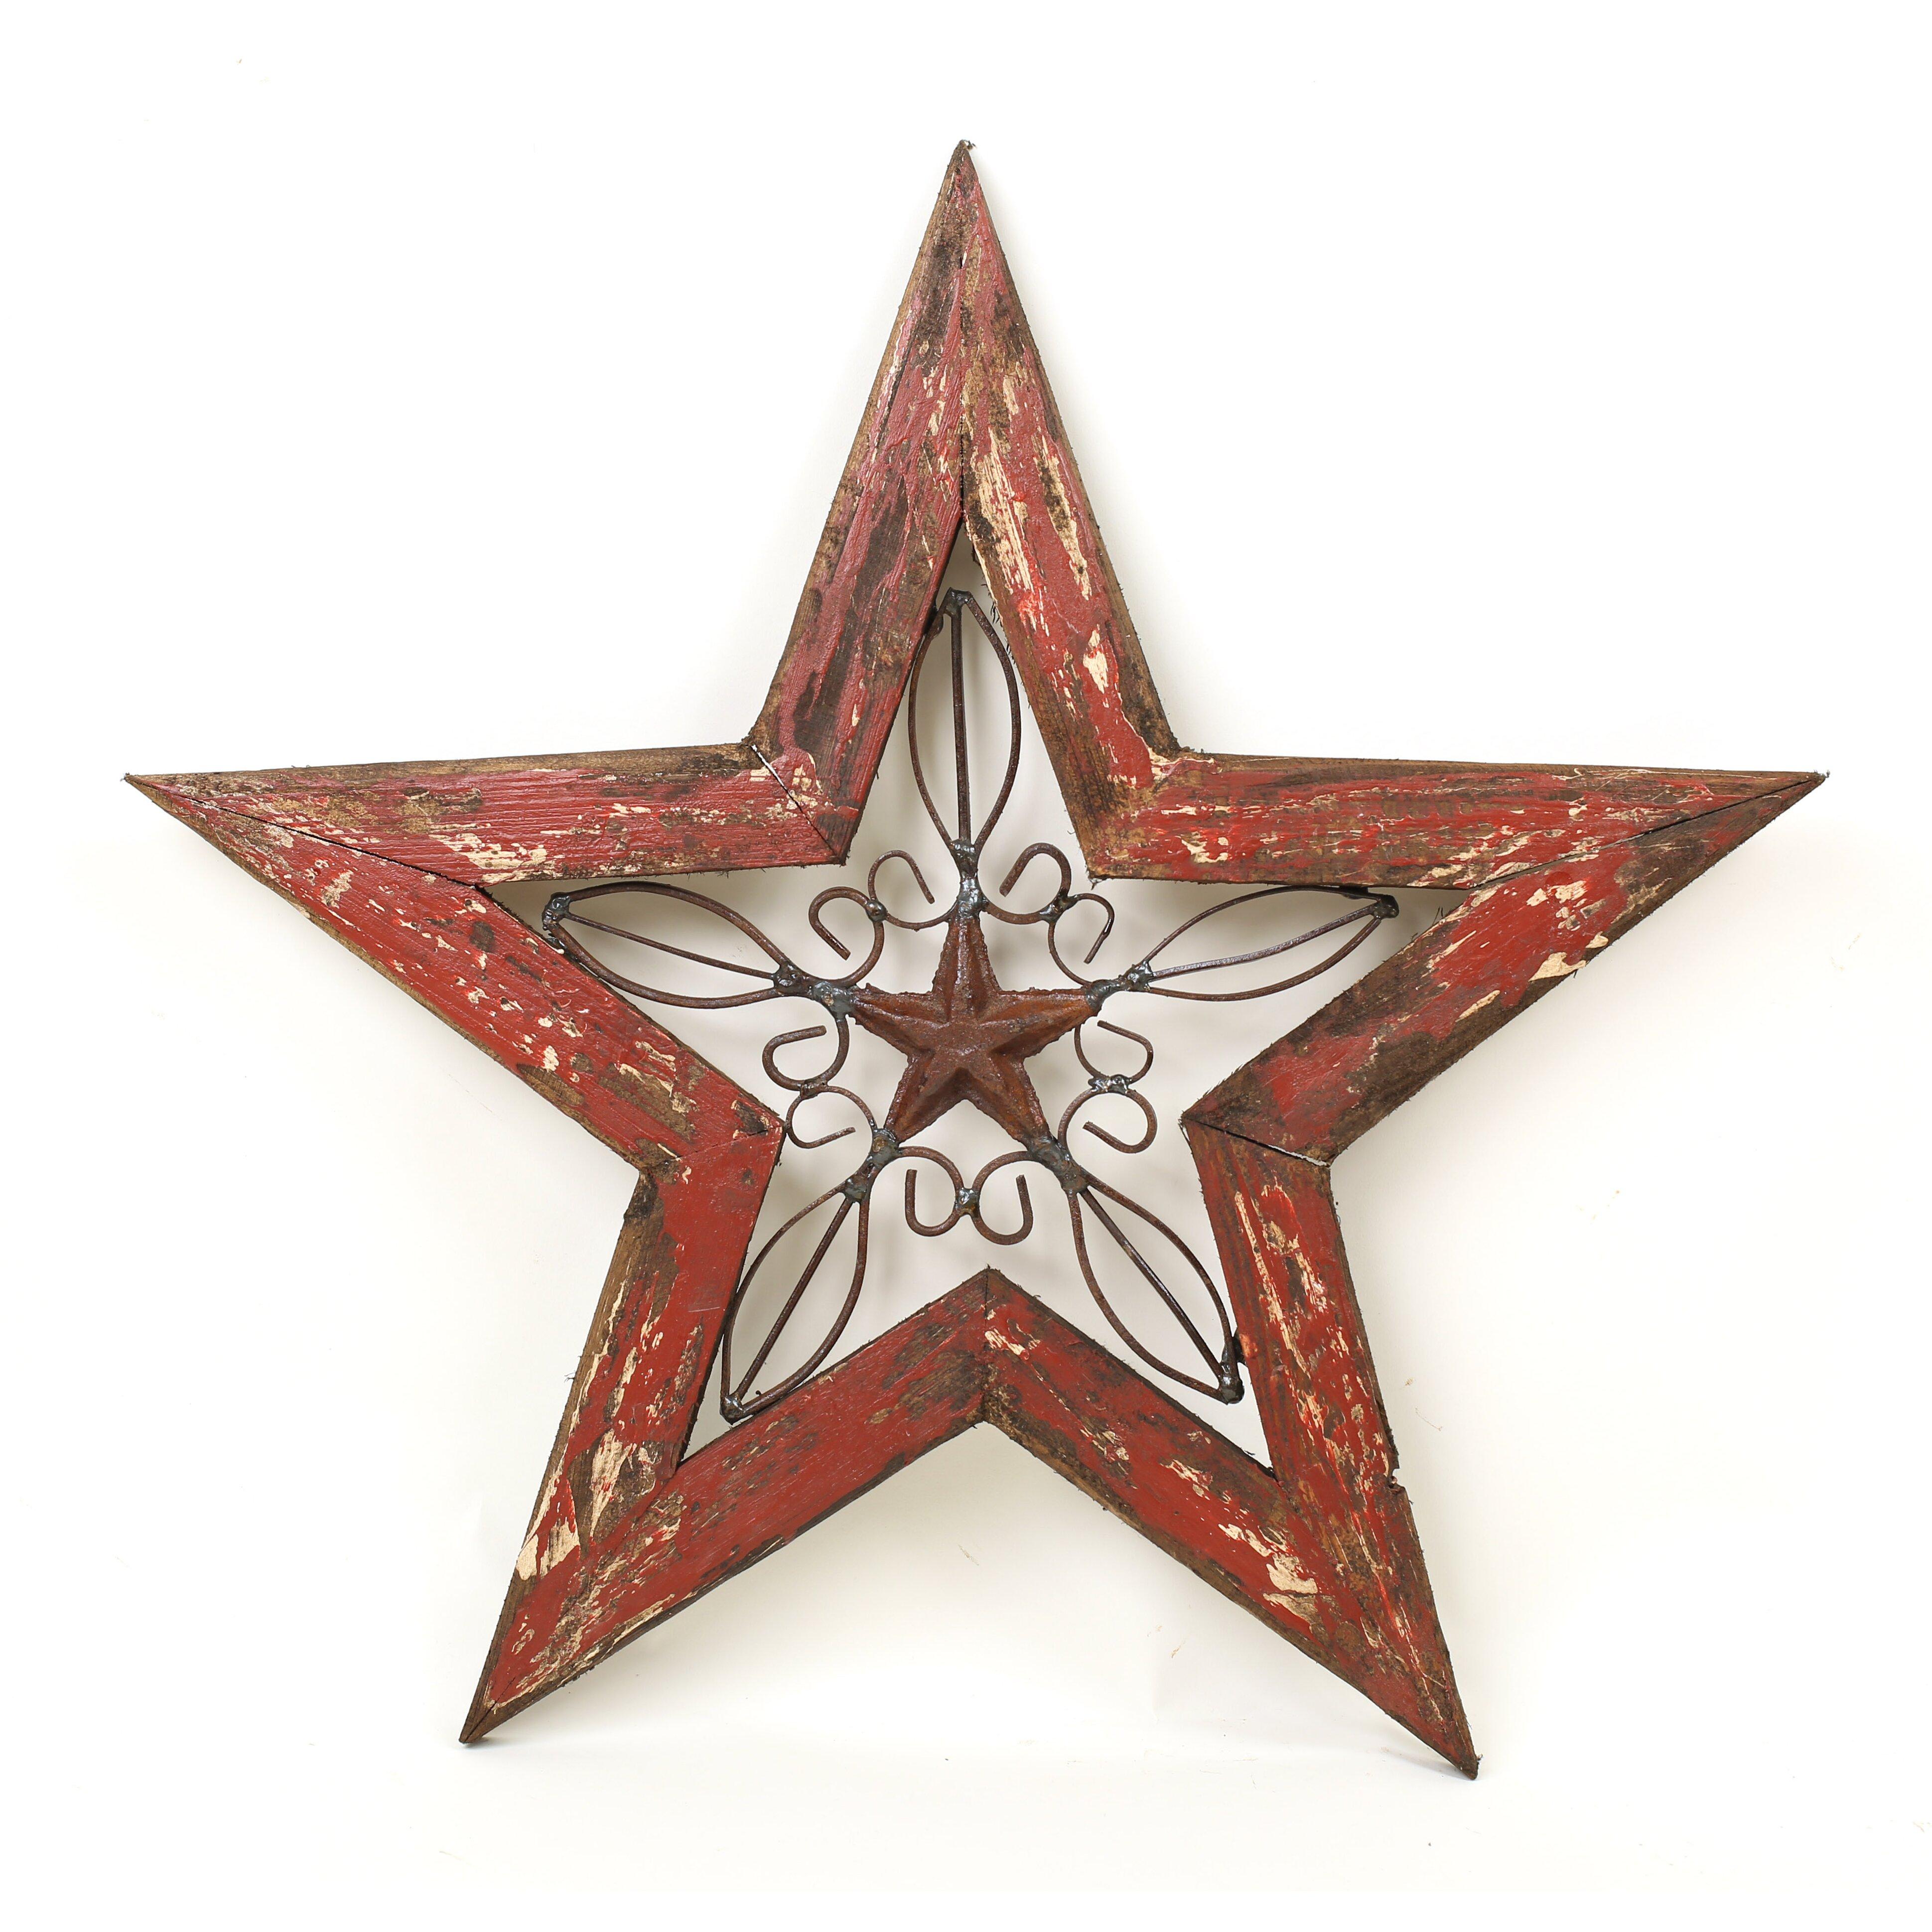 Glass Star Wall Decor : Myamigosimports texas star wall decor reviews wayfair